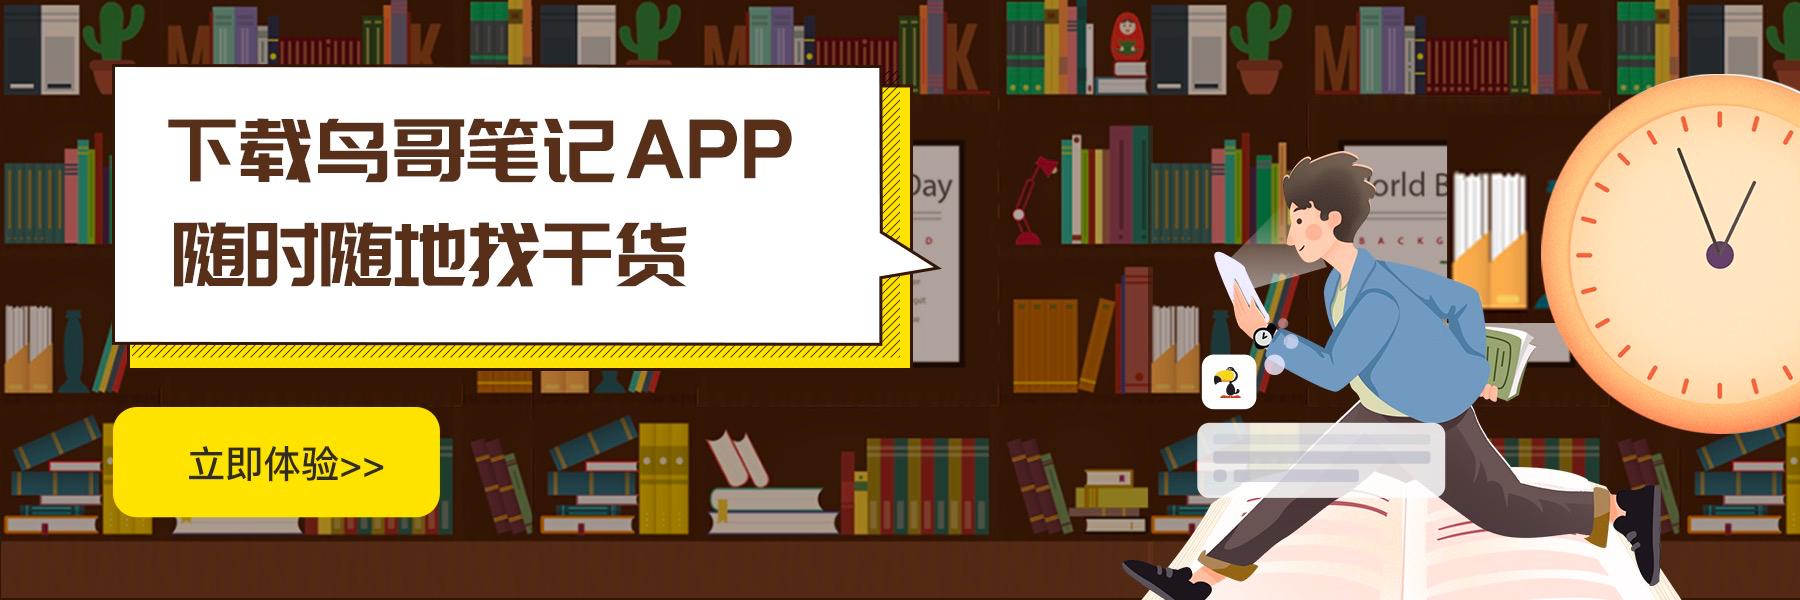 鸟哥笔记,ASO,Apple,APP推广,App Store